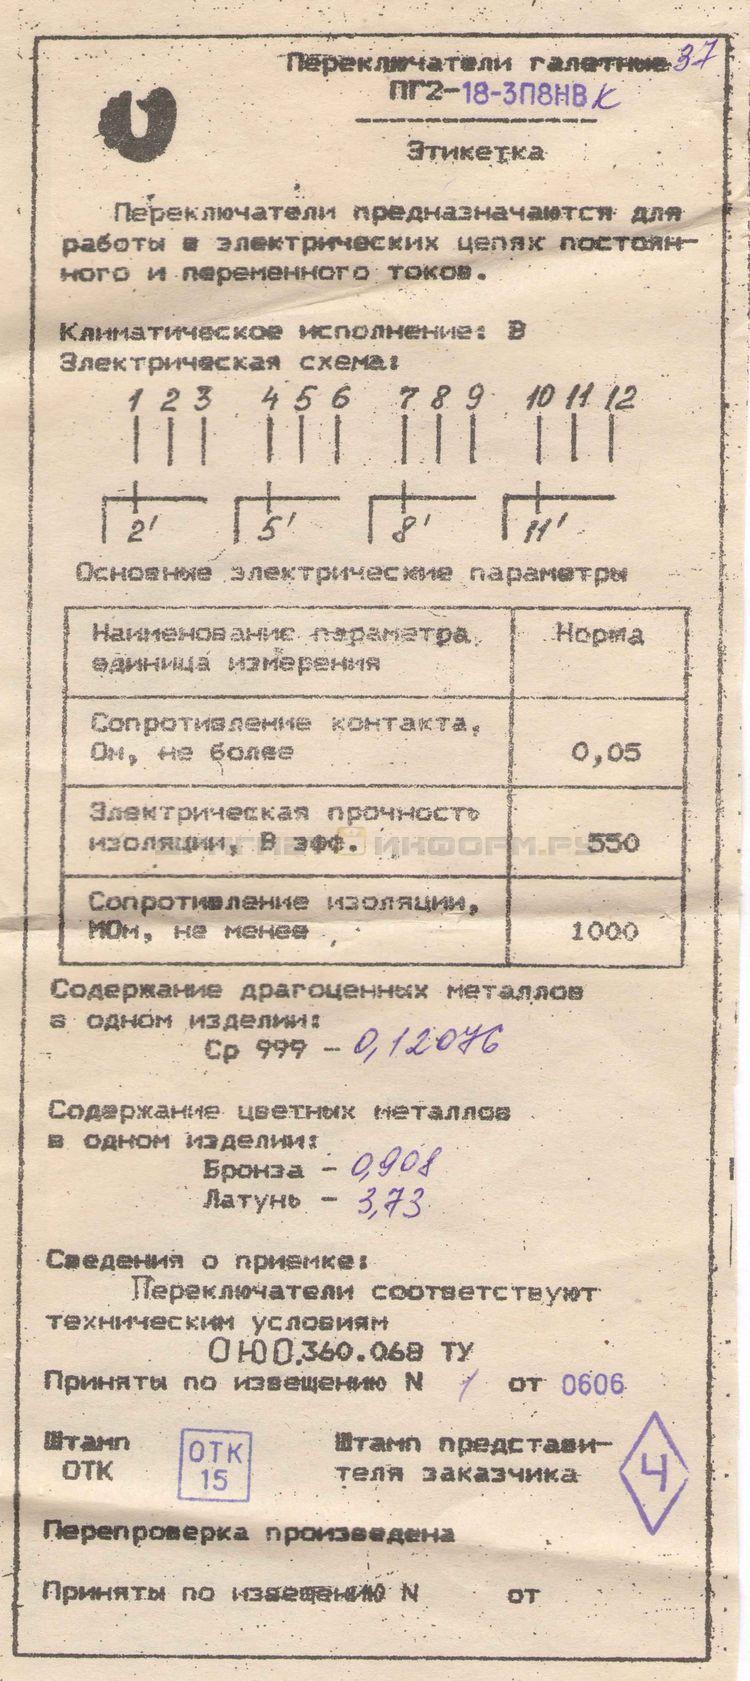 Формуляр ПГ2-18-3П8НВ